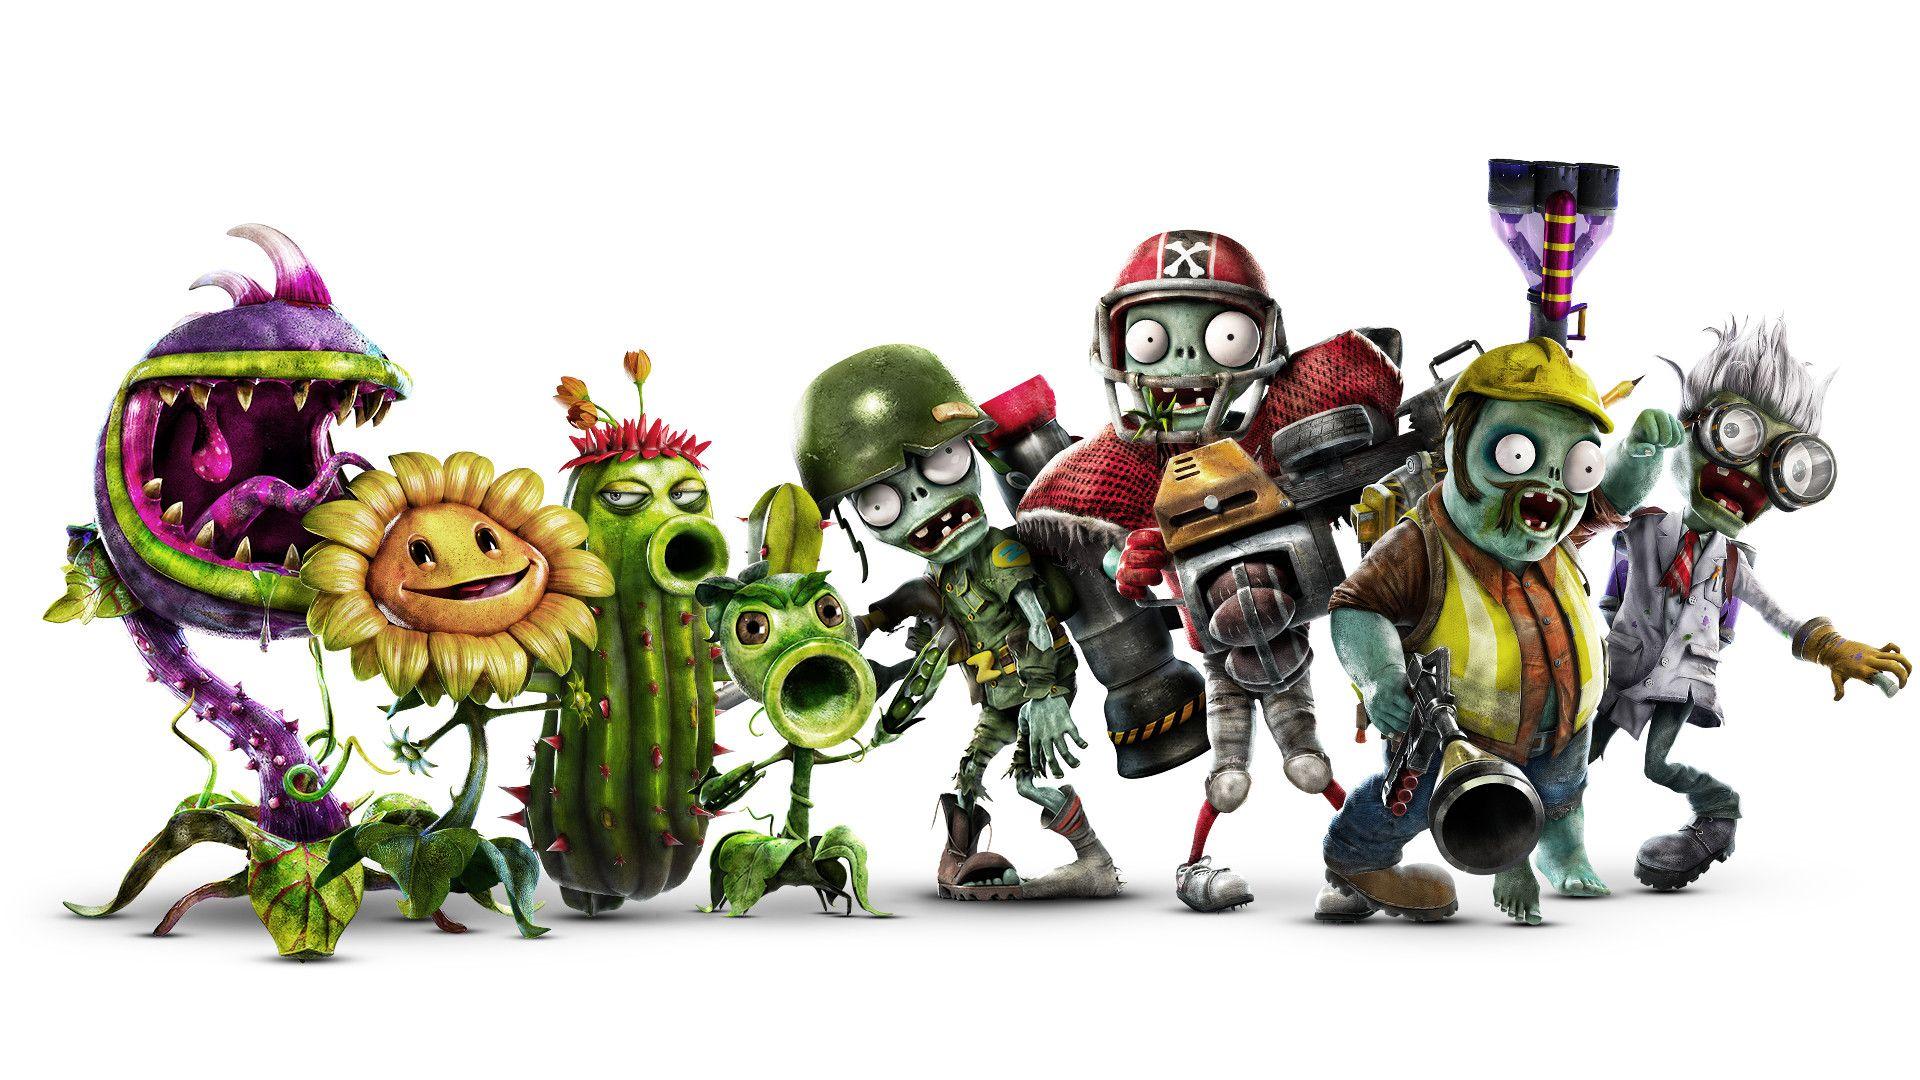 Plants vs zombies garden warfare 2 official site pvz - Plants vs zombies garden warfare 2 torchwood ...